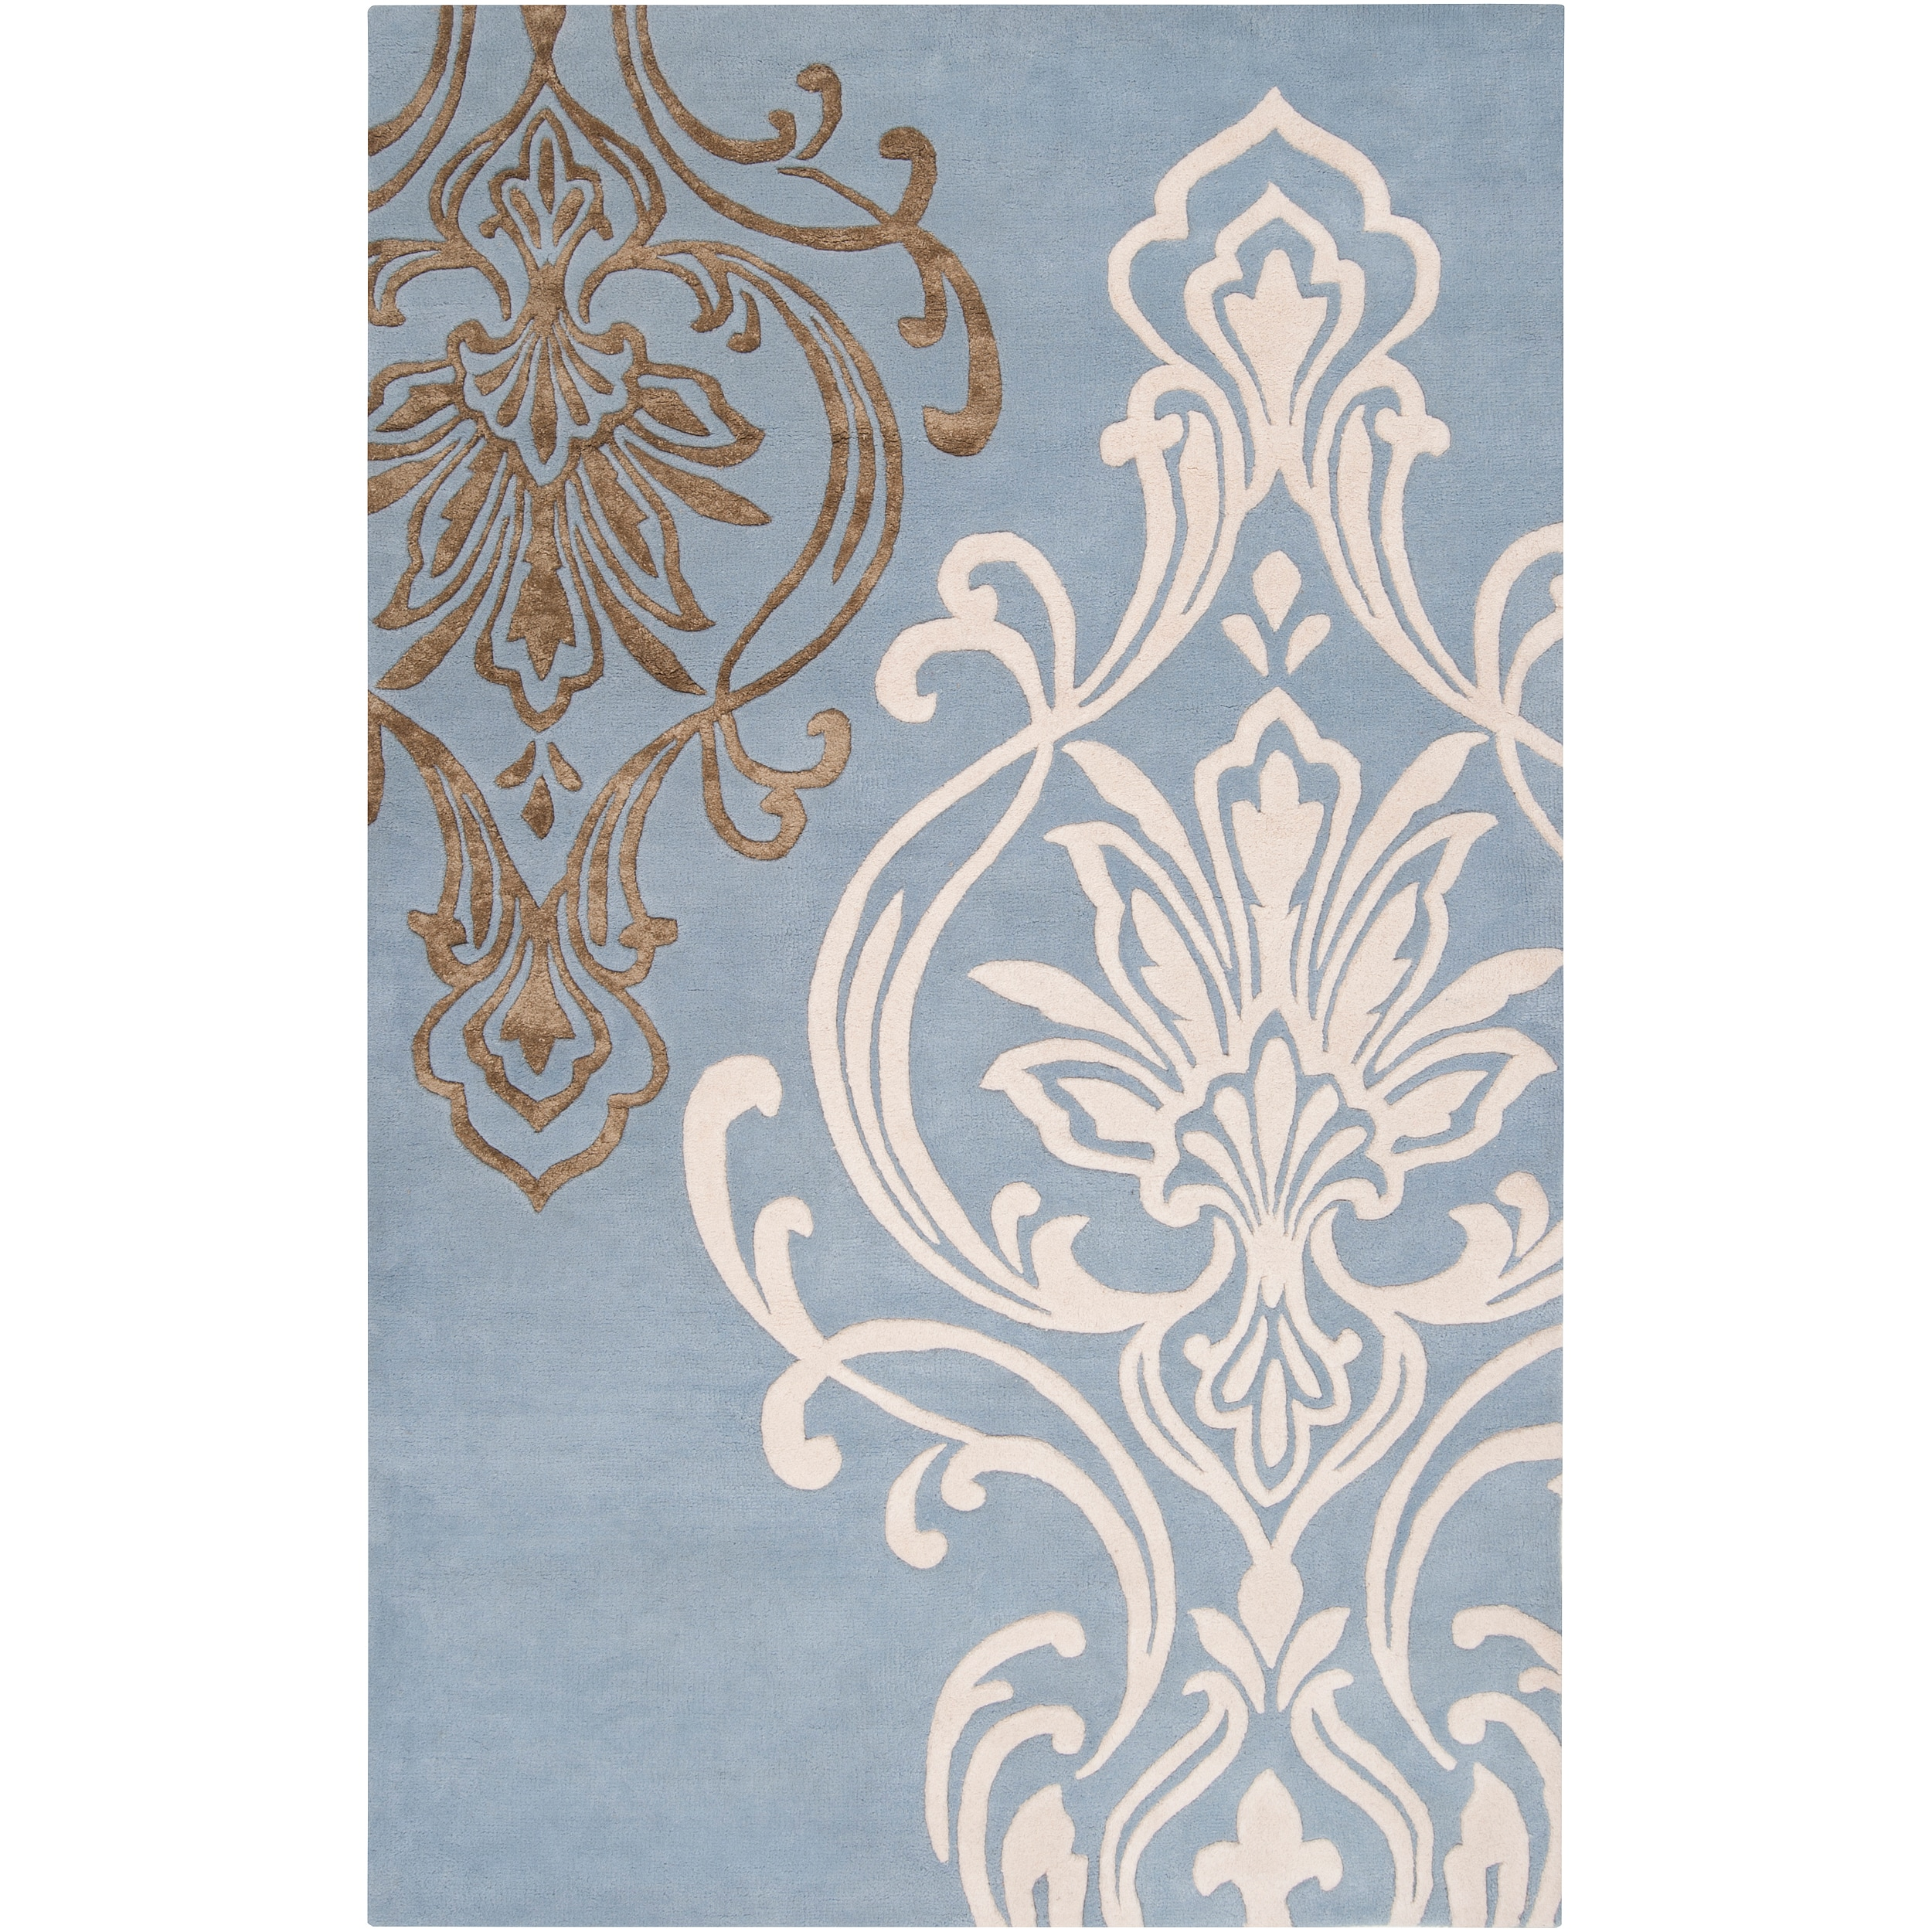 Candice Olson Hand-tufted Blue Pandora Damask Design Wool Rug (3'3 x 5'3)